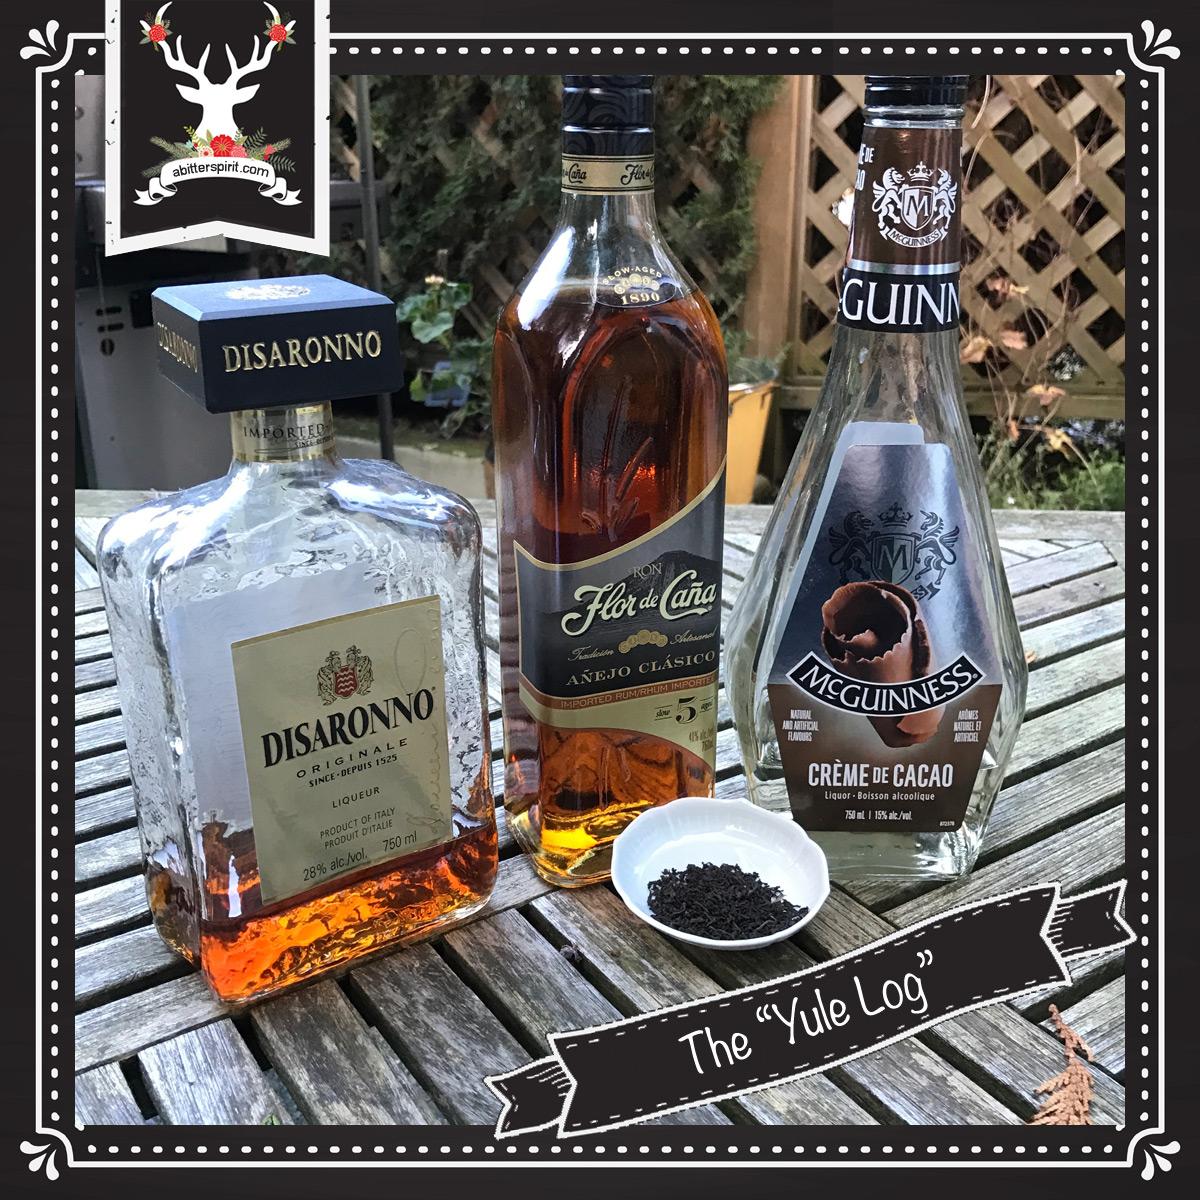 The 'Yule Log' Cocktail Ingredients - ABitterSpirit.com